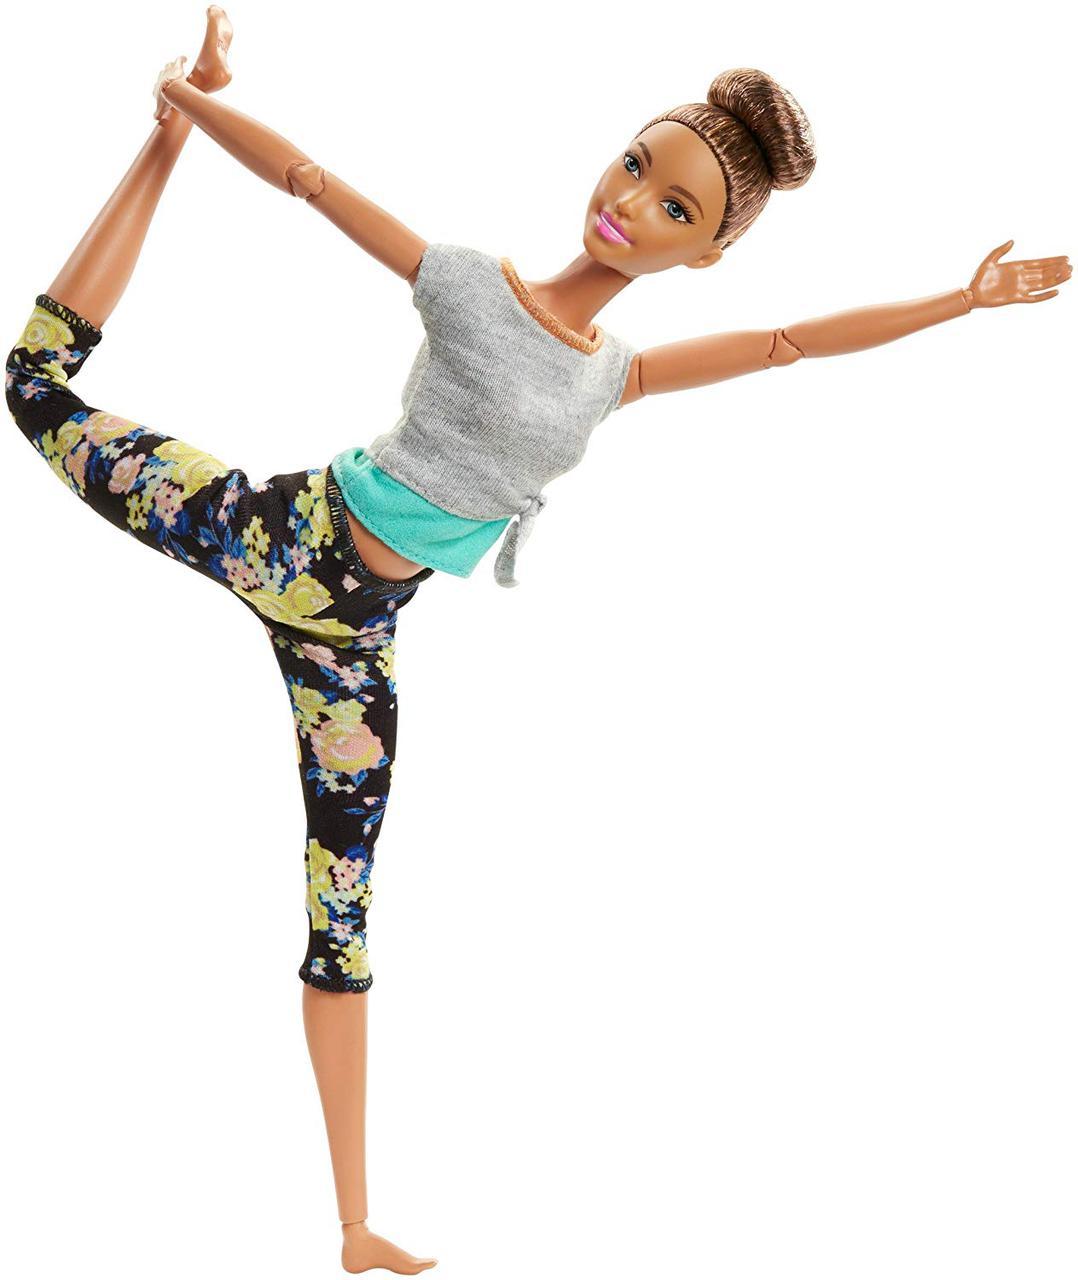 Кукла Барби Брюнетка Безграничные движения Двигайся как я Йога 22 Barbie Made To Move Doll, Brunette